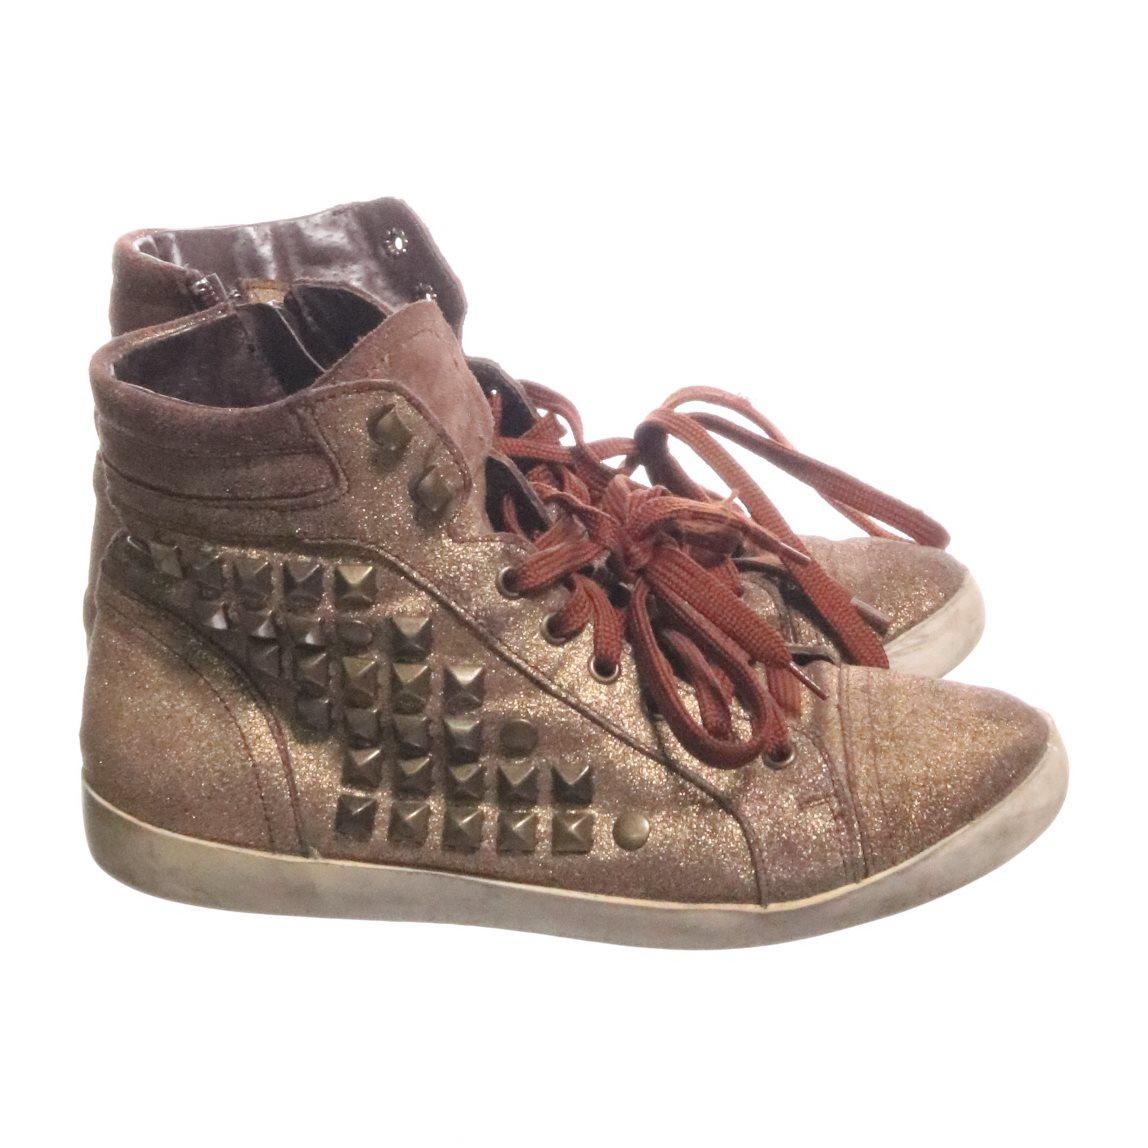 0f2b8f06b61 Scorett, Sneakers, Strl: 37, Flerfärgad (337879504) ᐈ Sellpy på Tradera